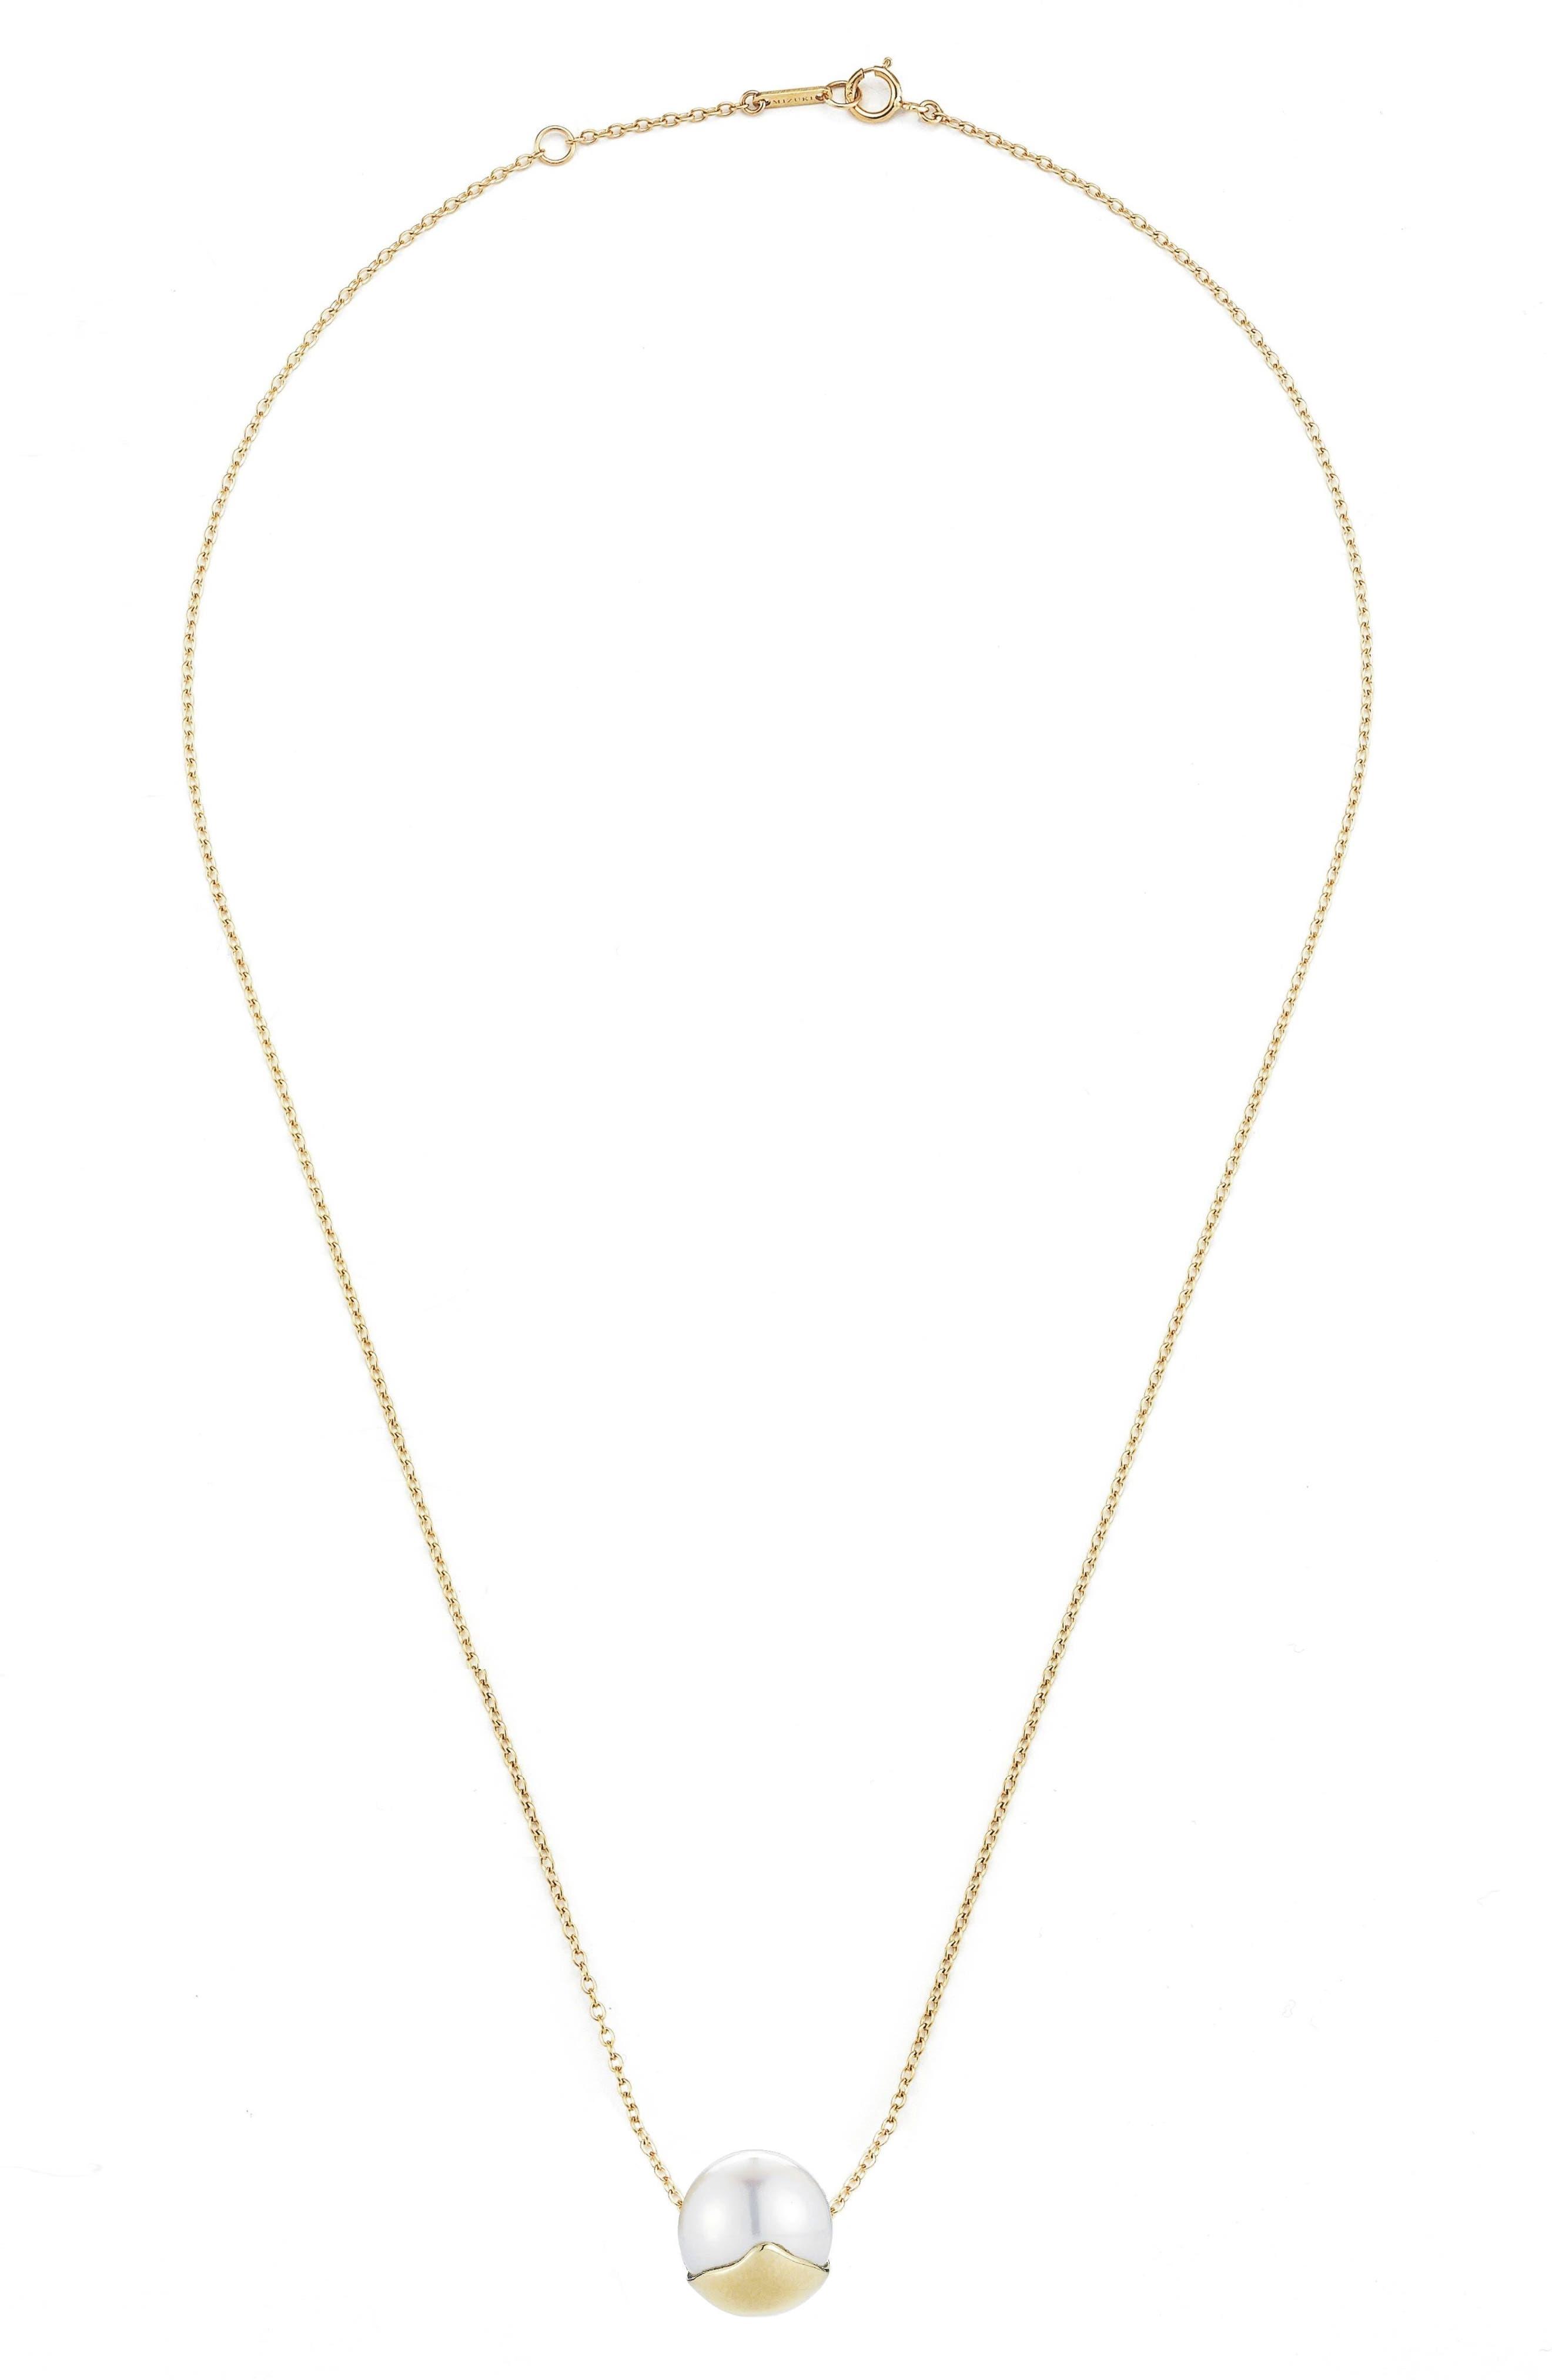 Sea of Beauty Pearl Pendant Necklace,                             Main thumbnail 1, color,                             710